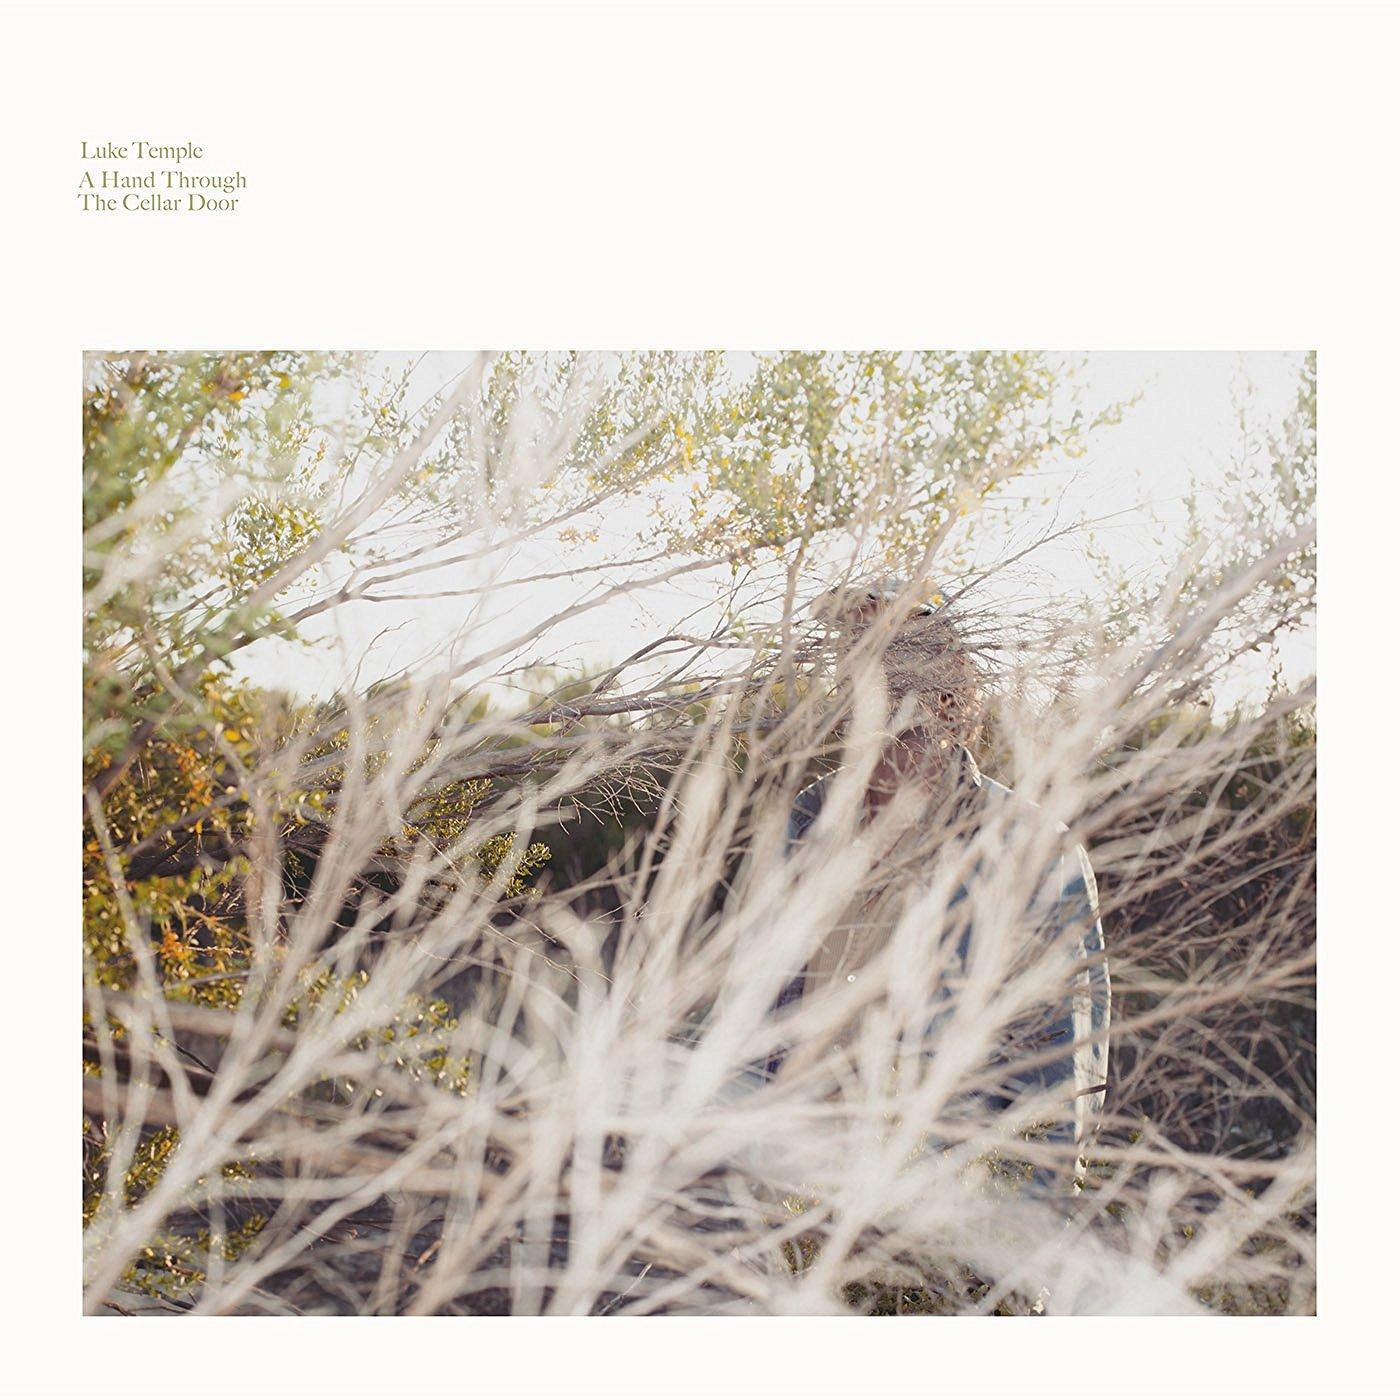 Vinilo : Luke Temple - A Hand Through The Cellar Door (LP Vinyl)